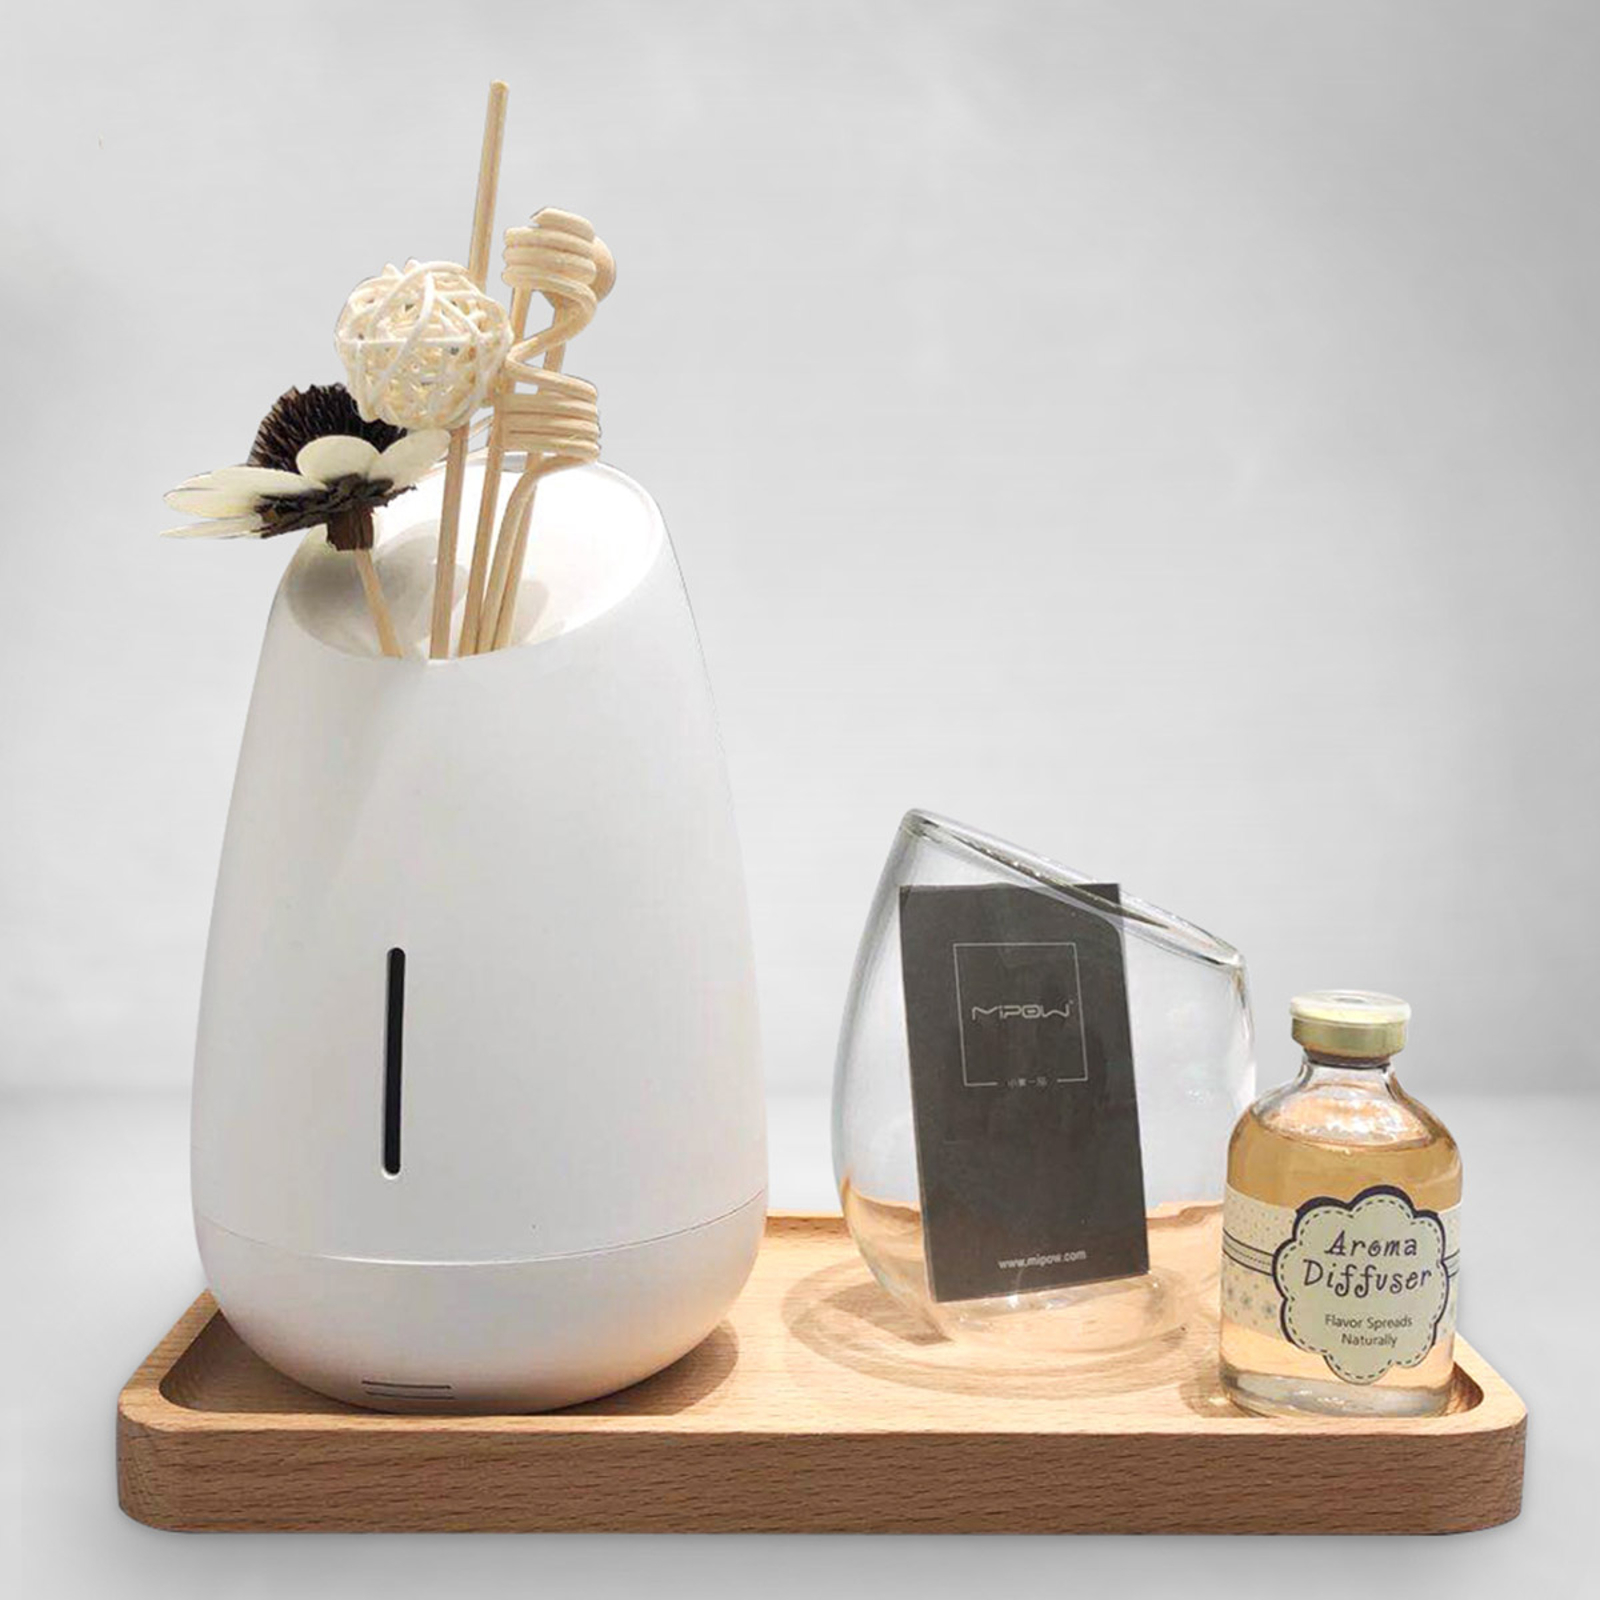 MiPow Vaso Aroma-diffusor met muziek, wit